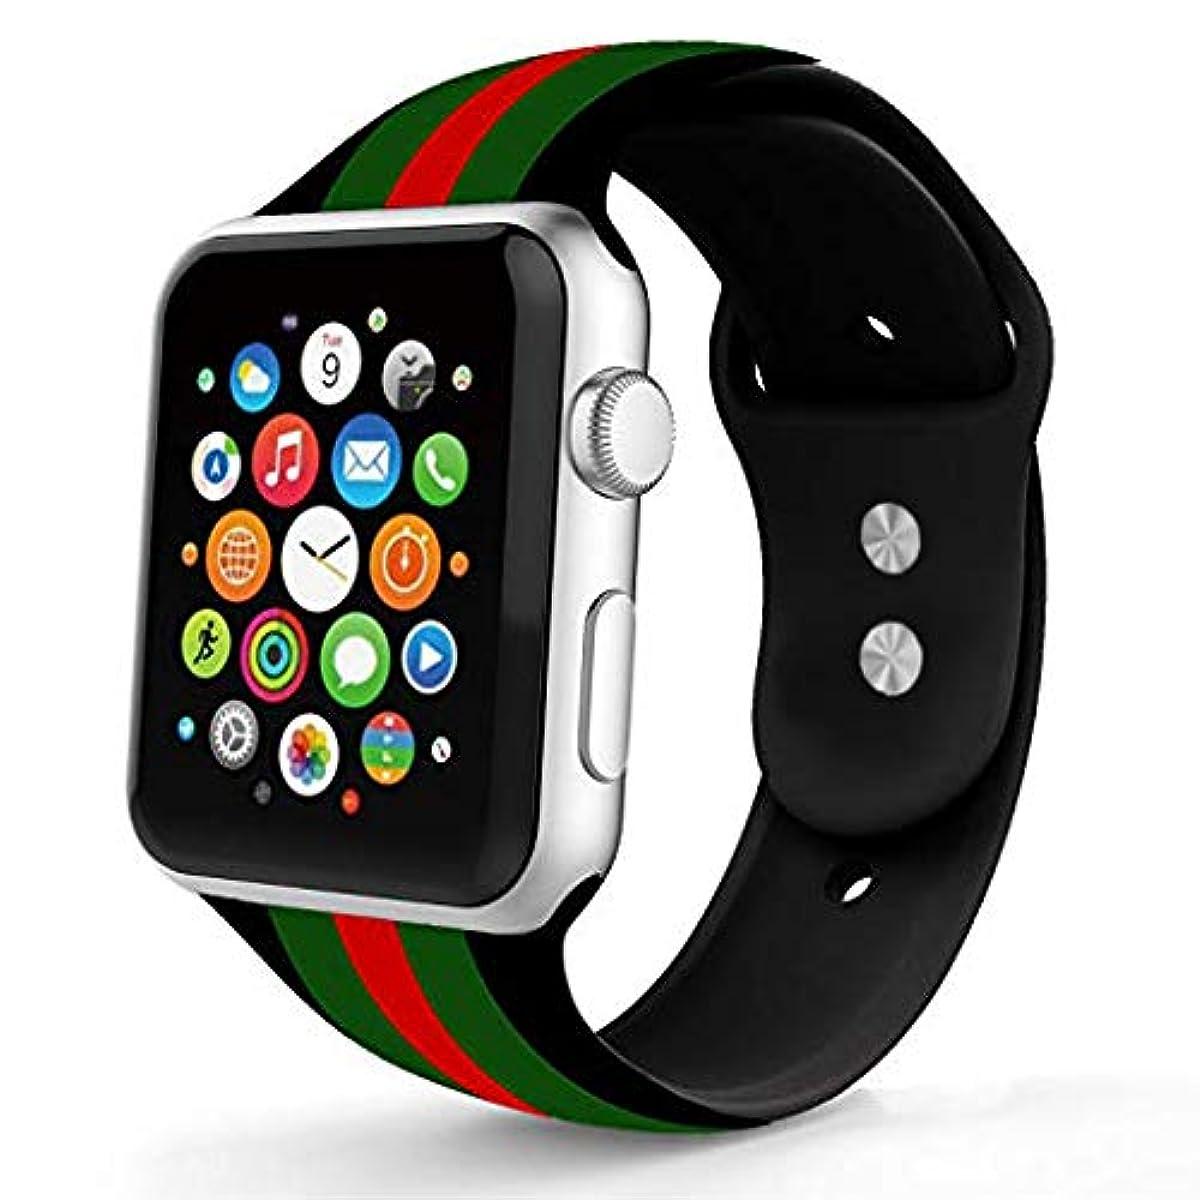 6e9cf9e97f2 Apple Watch Band Gucci Black Iwatch Silicone 42mm 44mm Series 2 3 4  Accessories